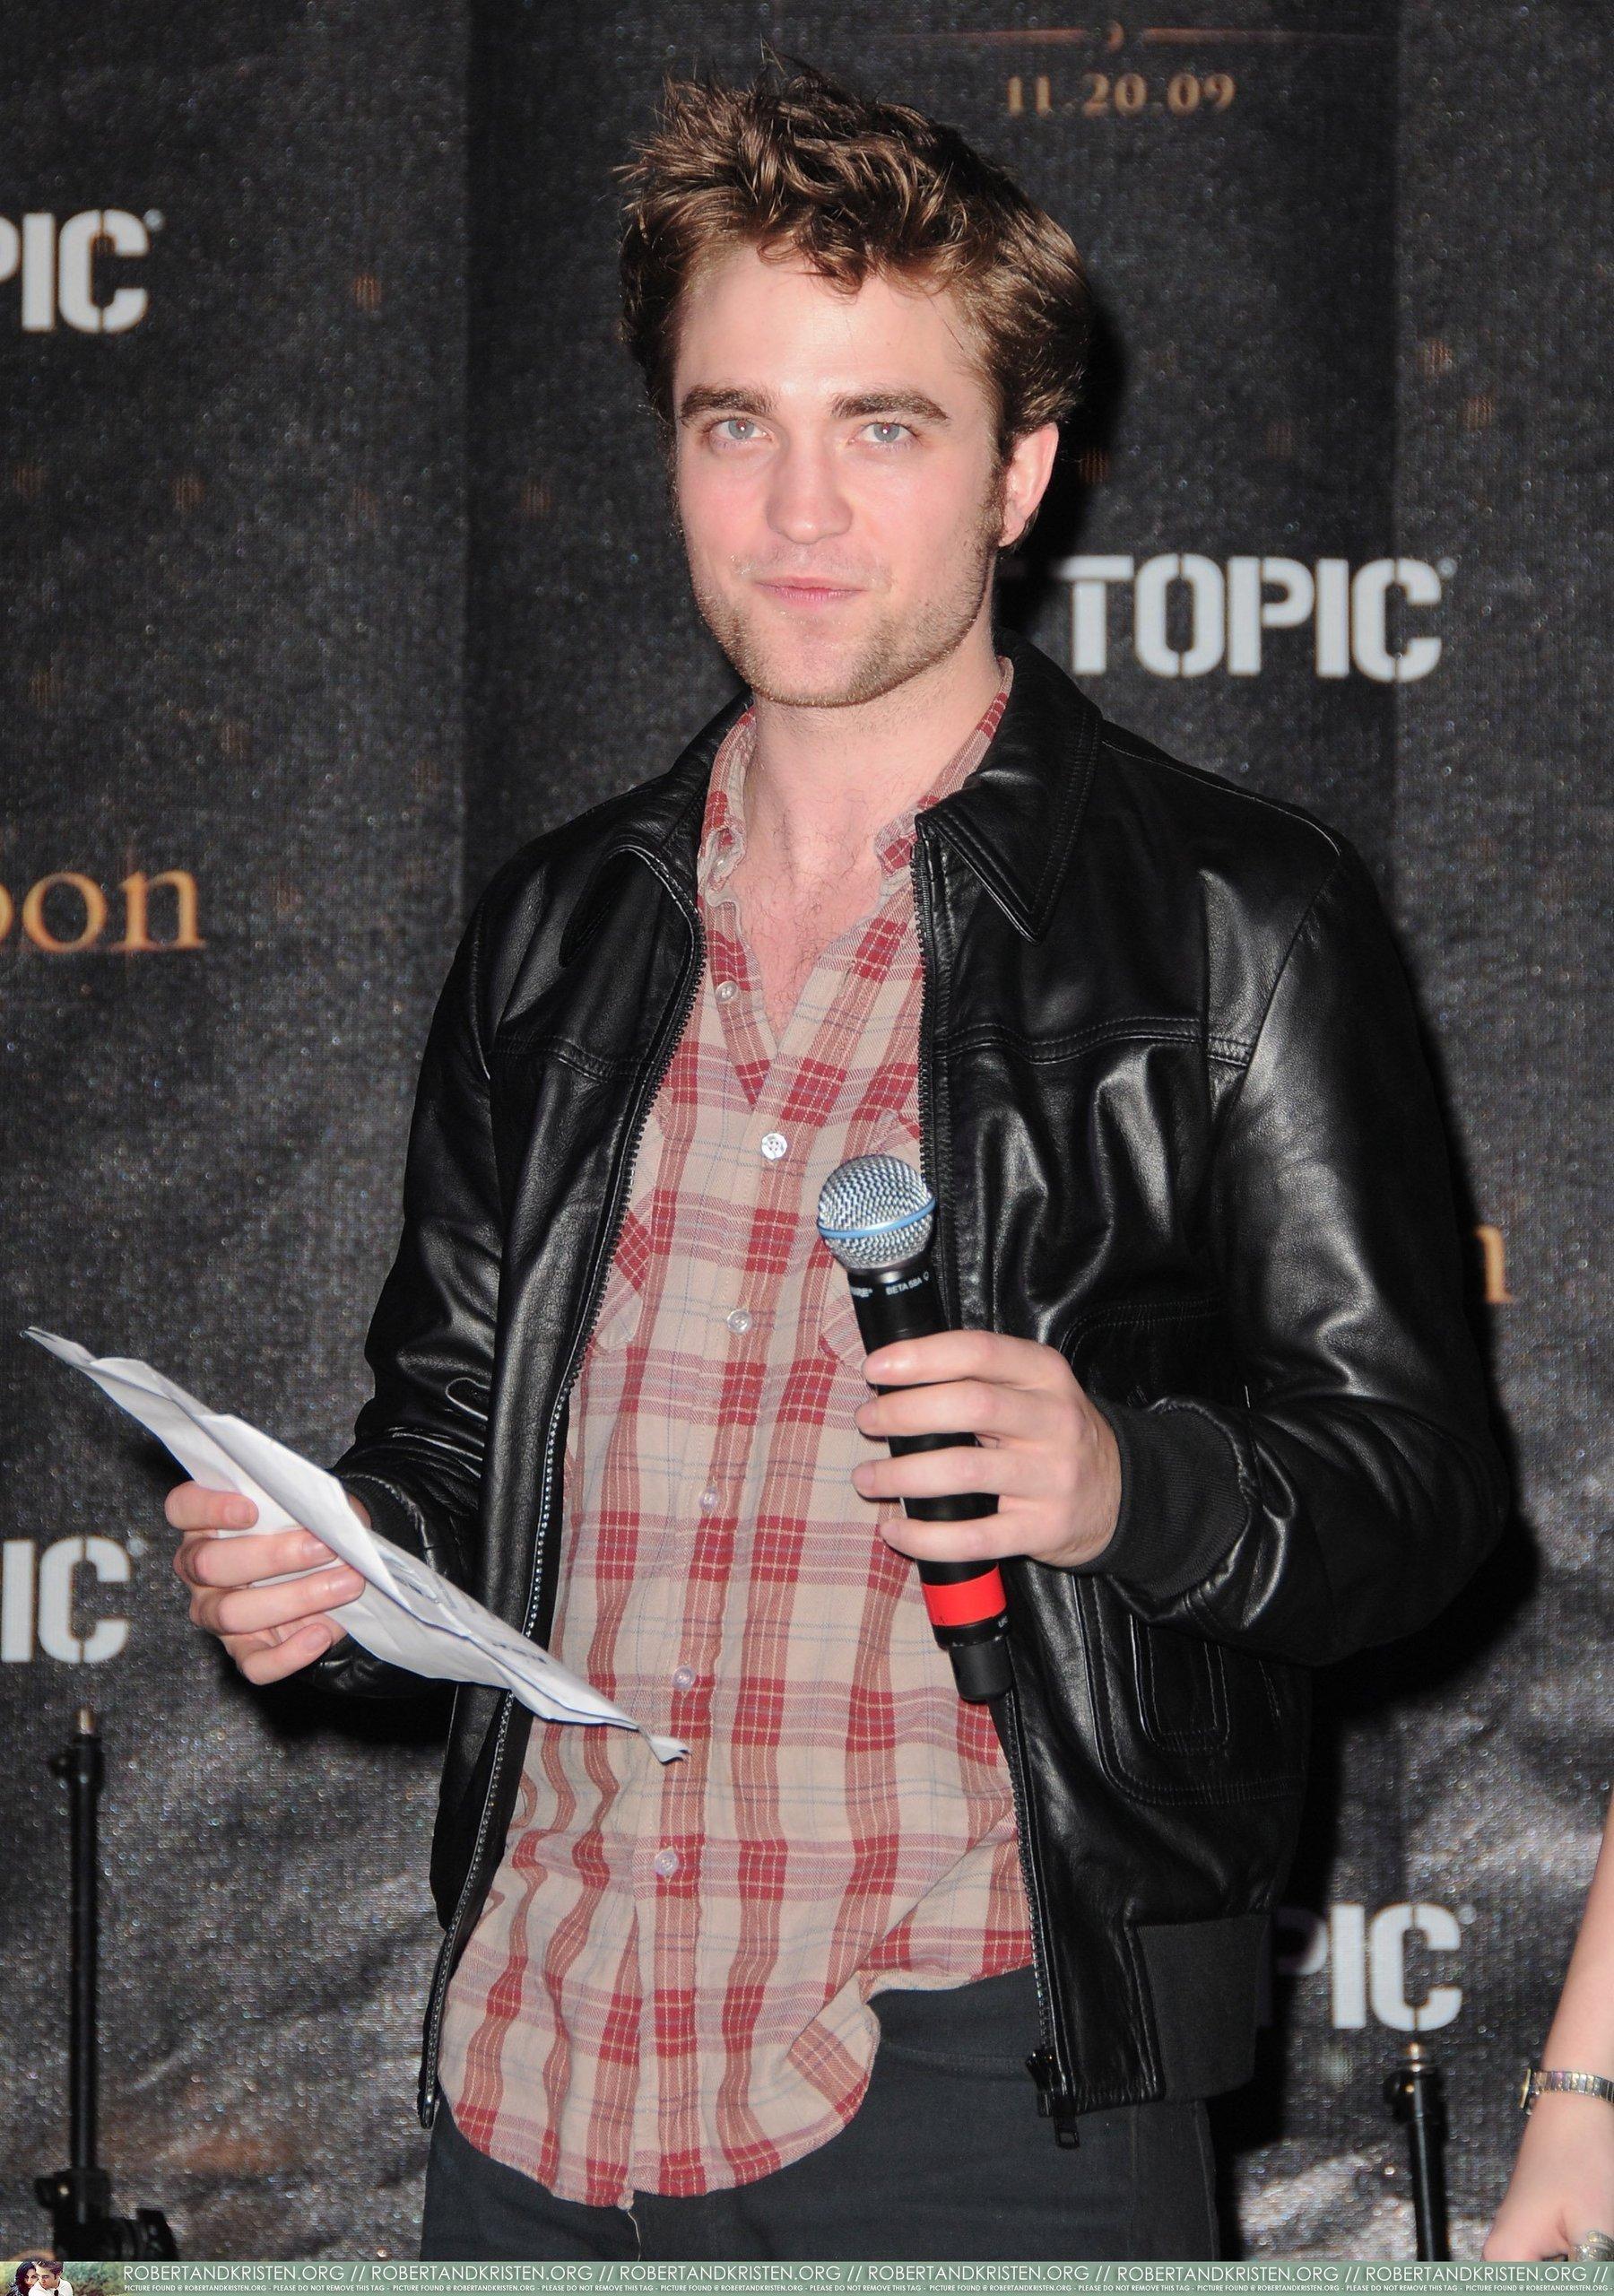 HQ 사진 of Robert Pattinson at Hot Topic